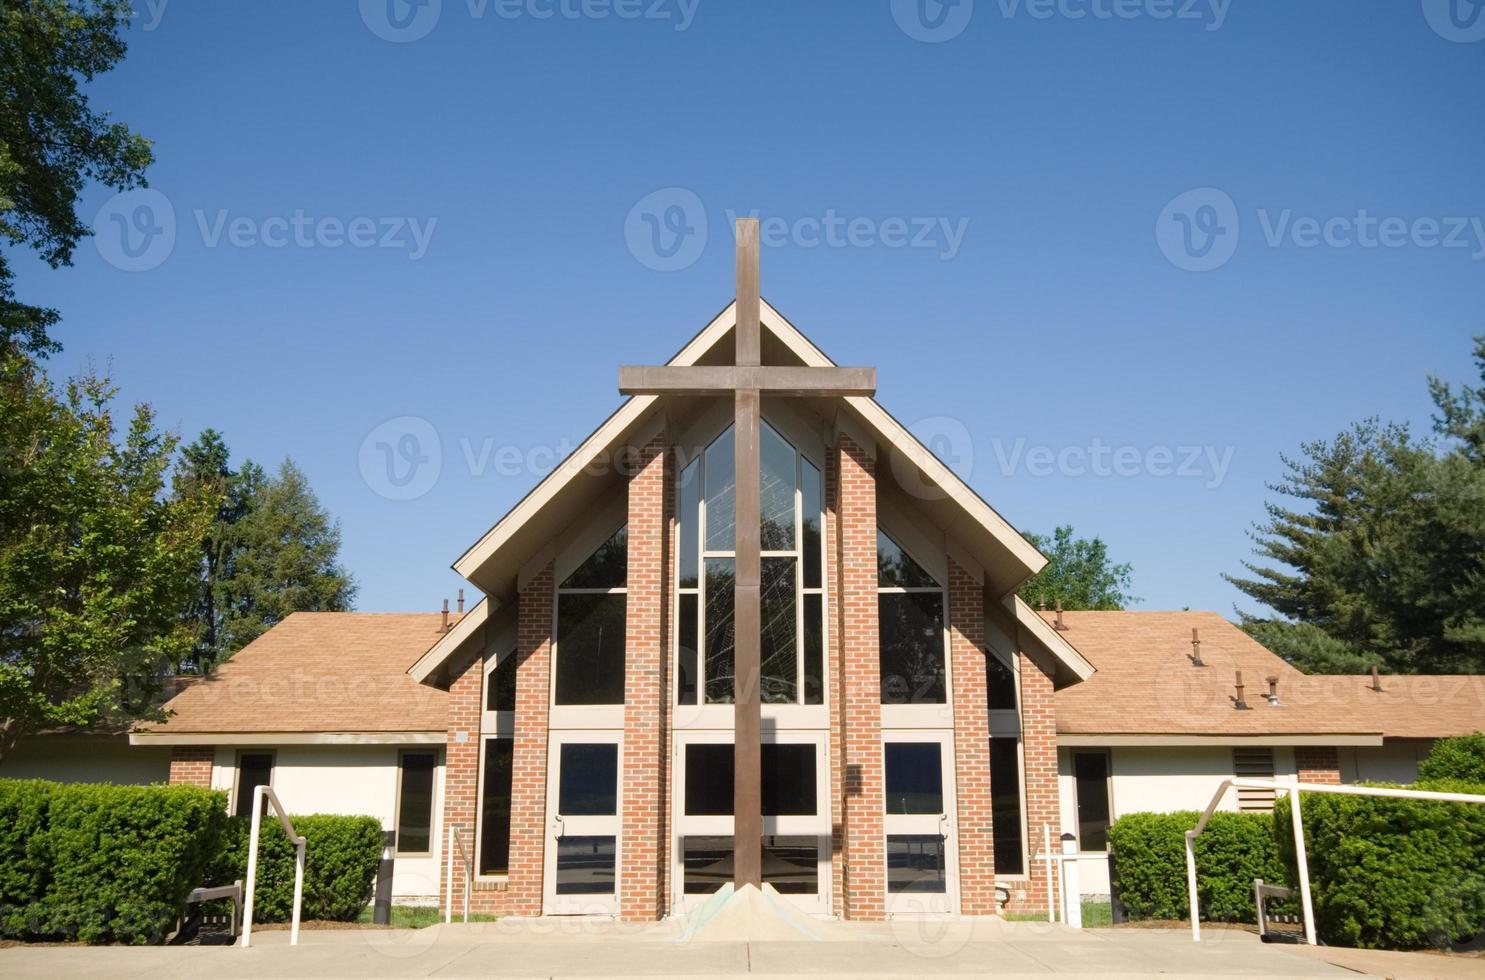 iglesia moderna frontal, gran cruz, cielo azul, gran angular foto